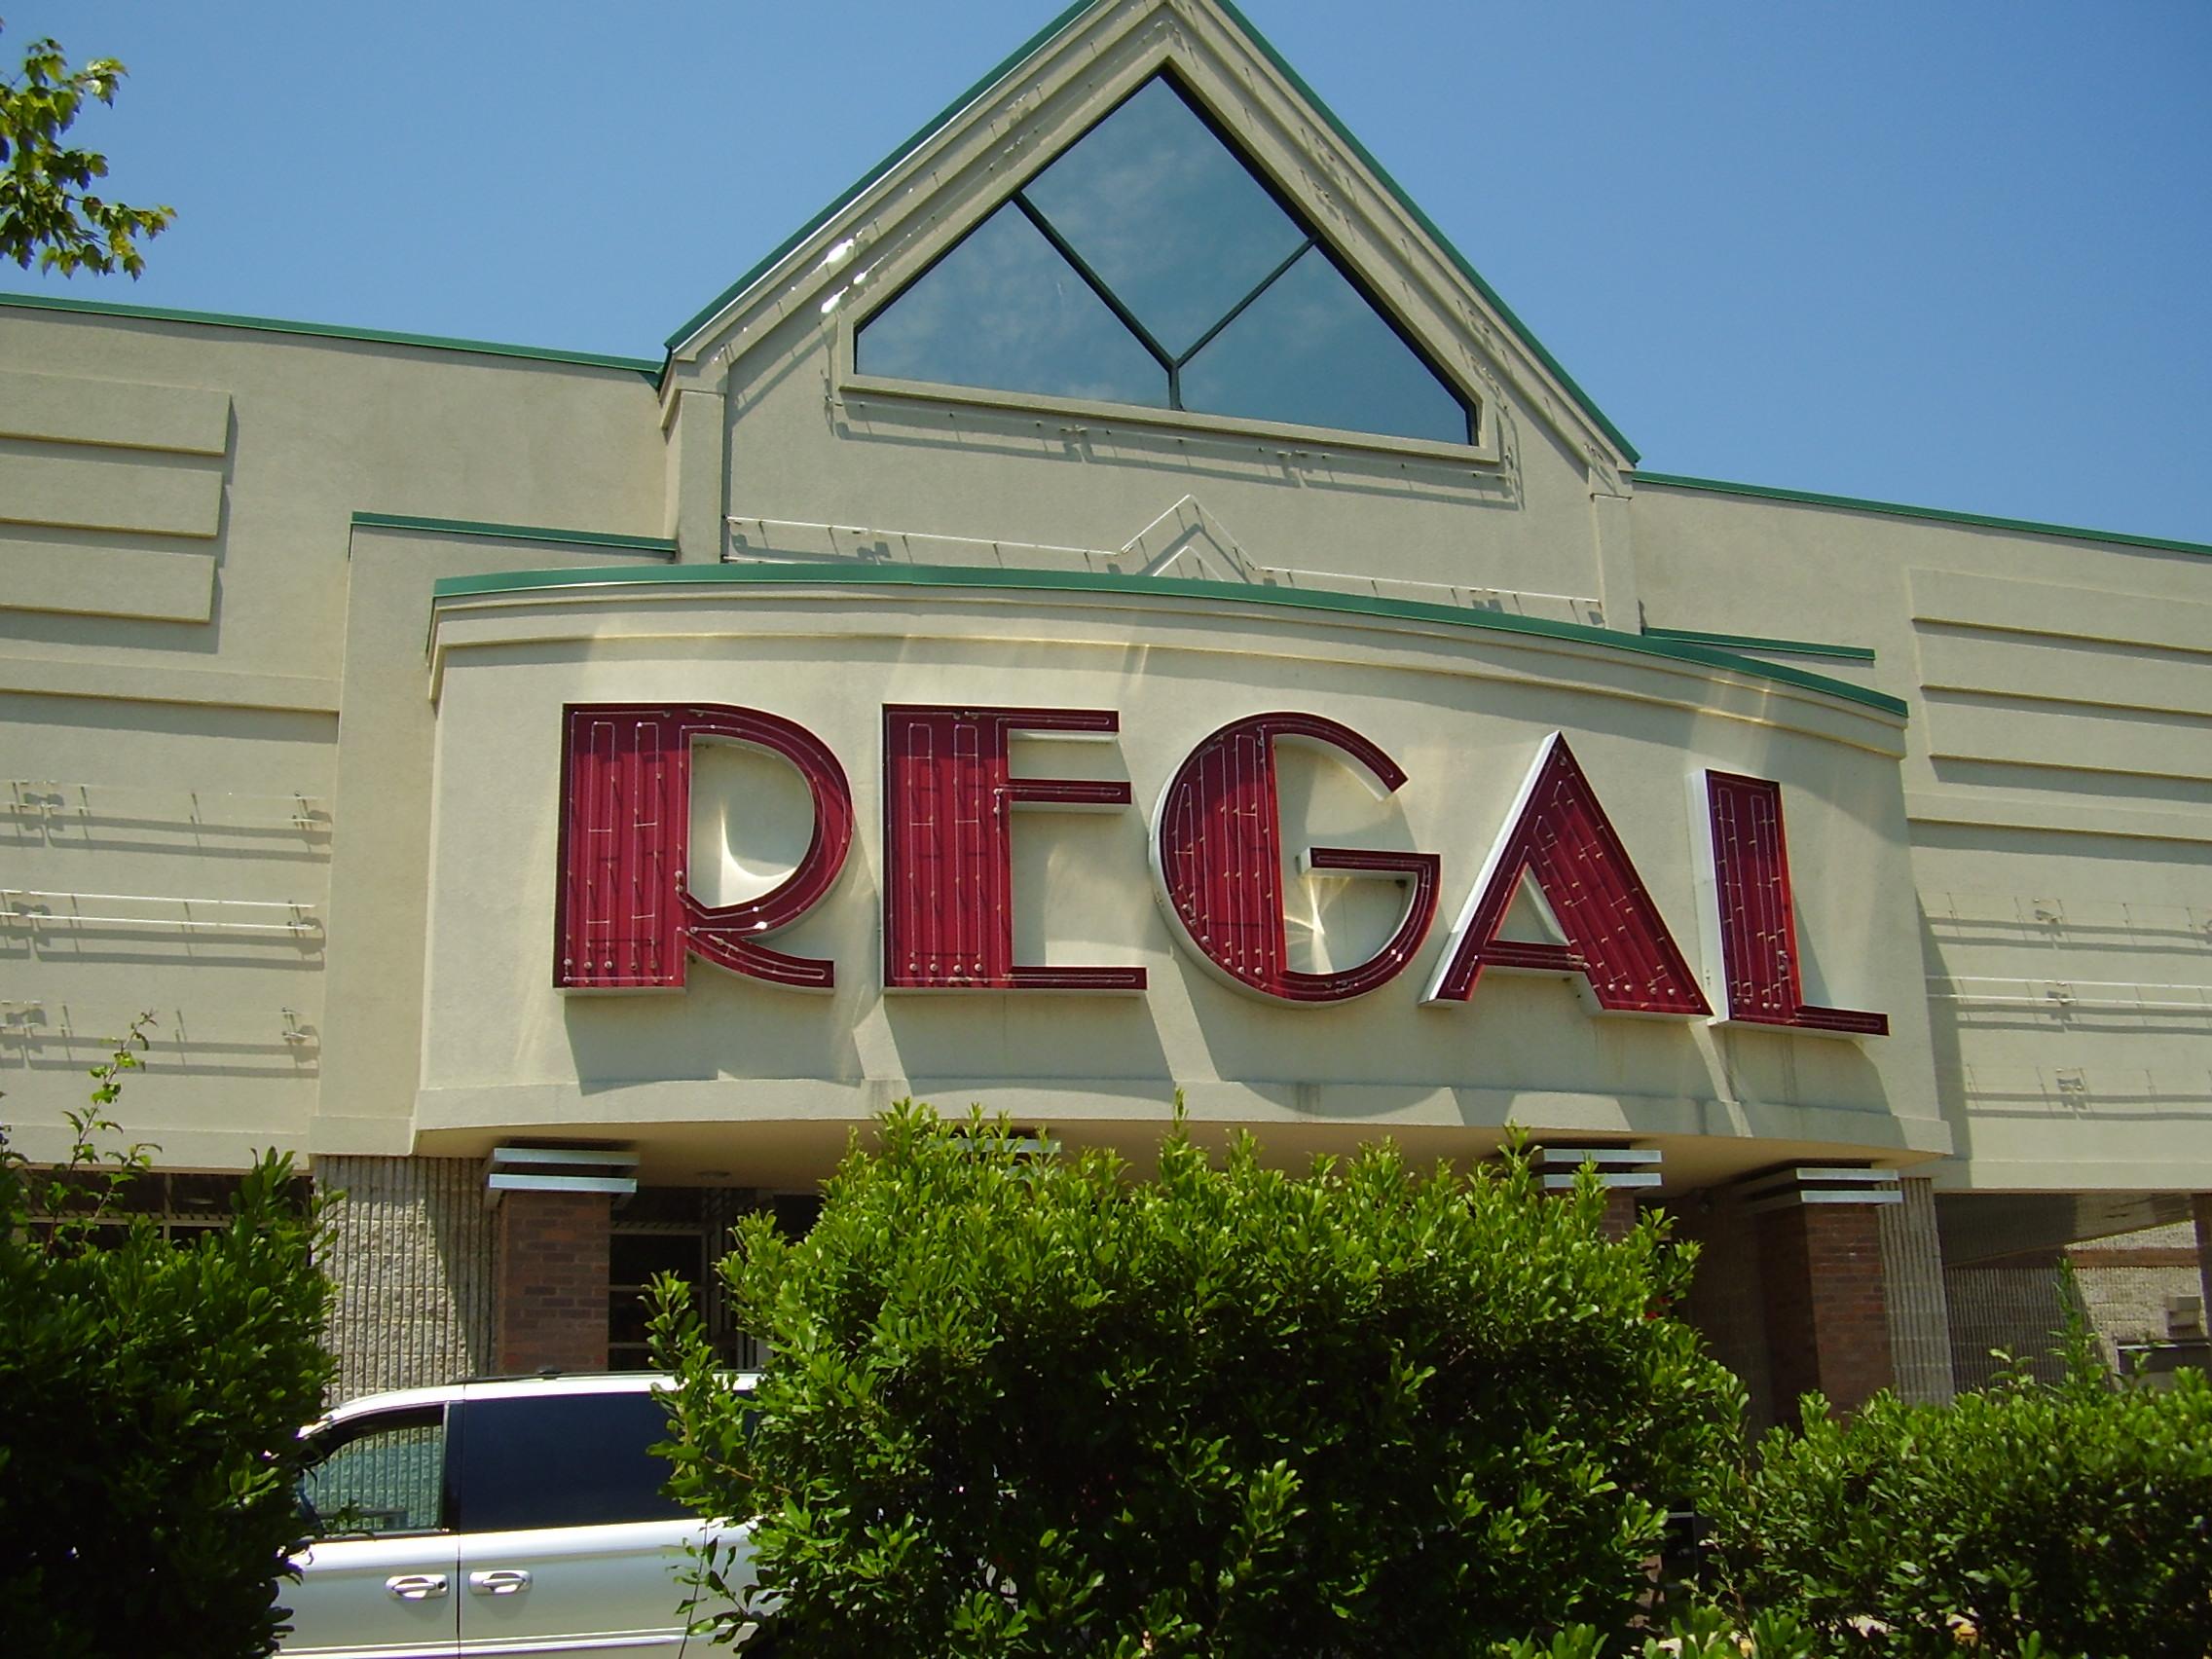 Jun 20, · 17 reviews of Regal Entertainment Group - Corporate Office